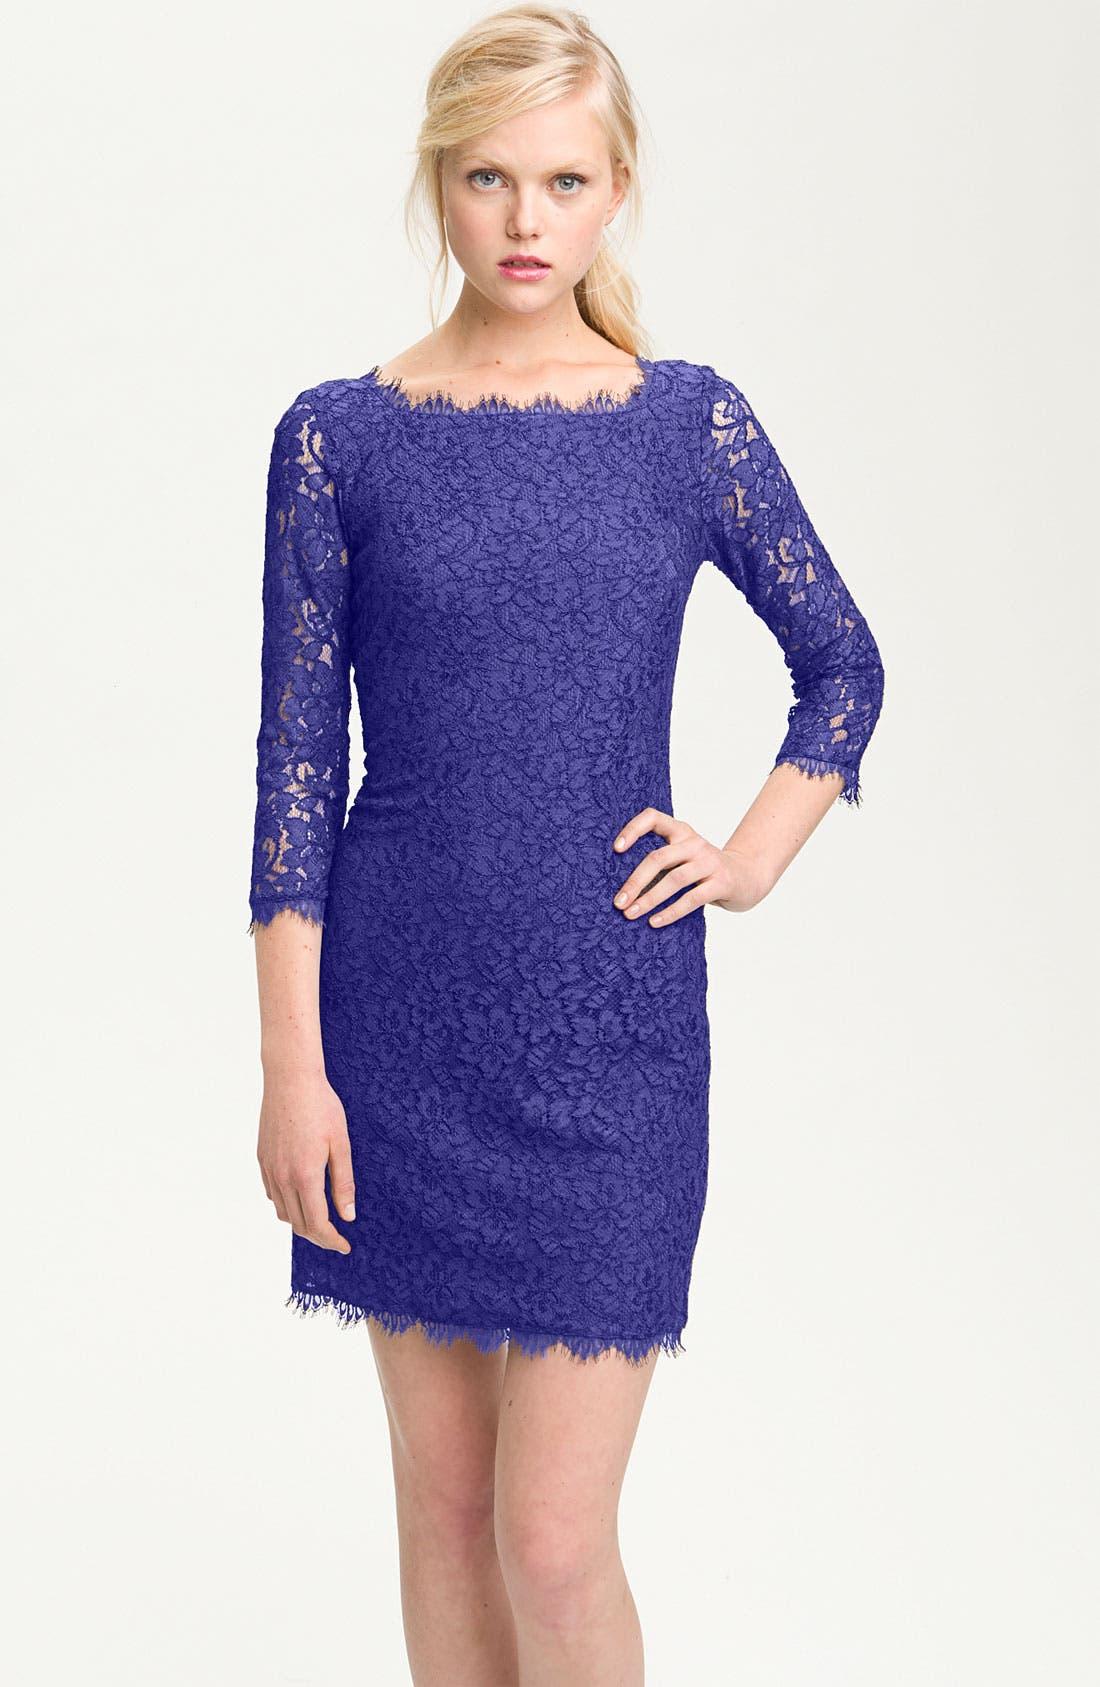 Alternate Image 1 Selected - Diane von Furstenberg 'Zarita' Lace Sheath Dress